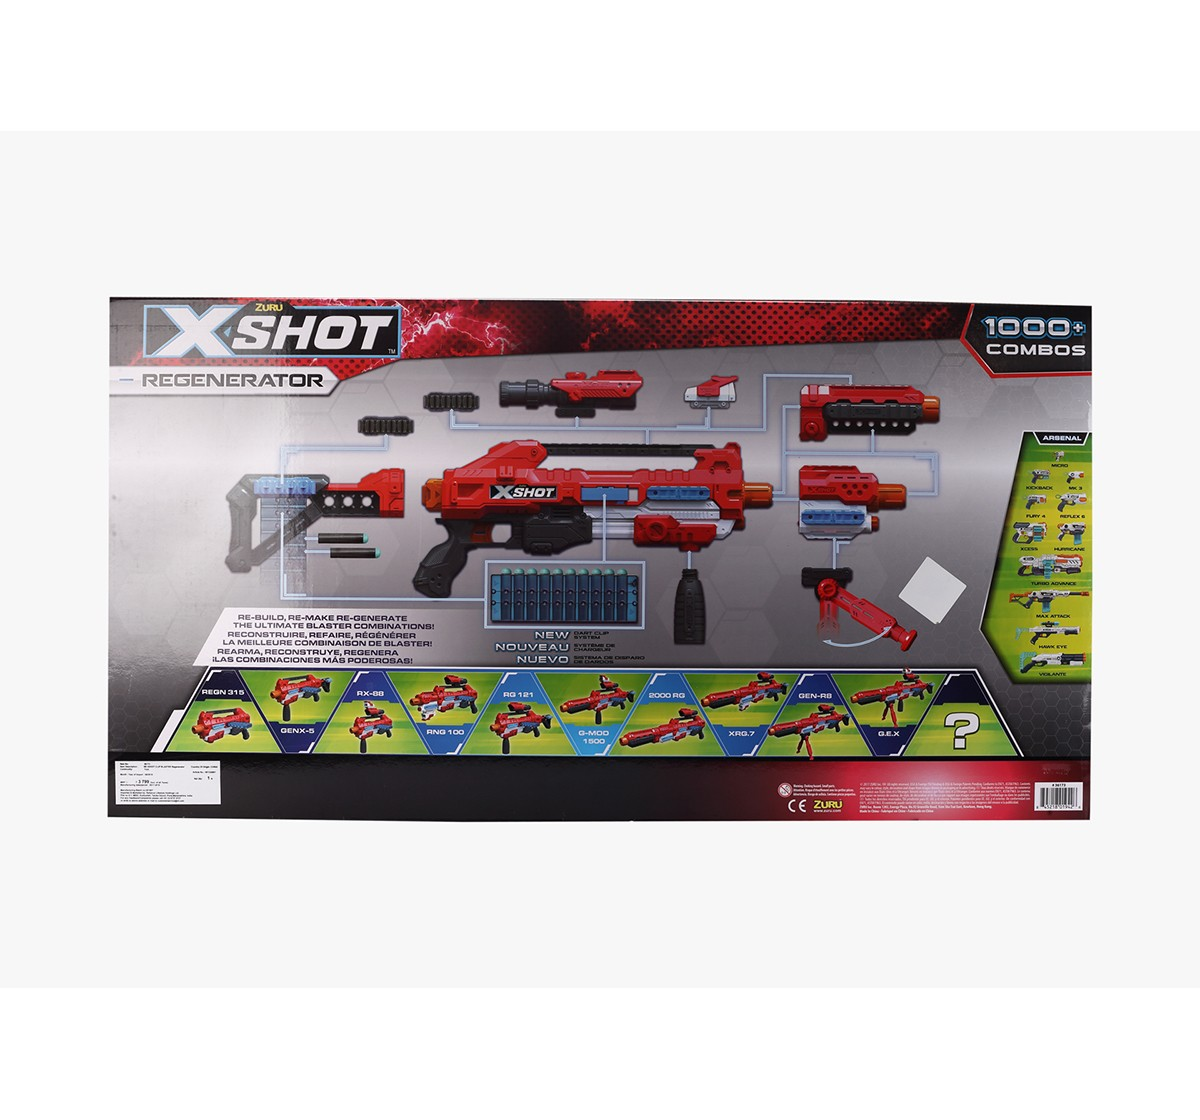 X-Shot Excel Regenerator Blasters for Kids age 8Y+